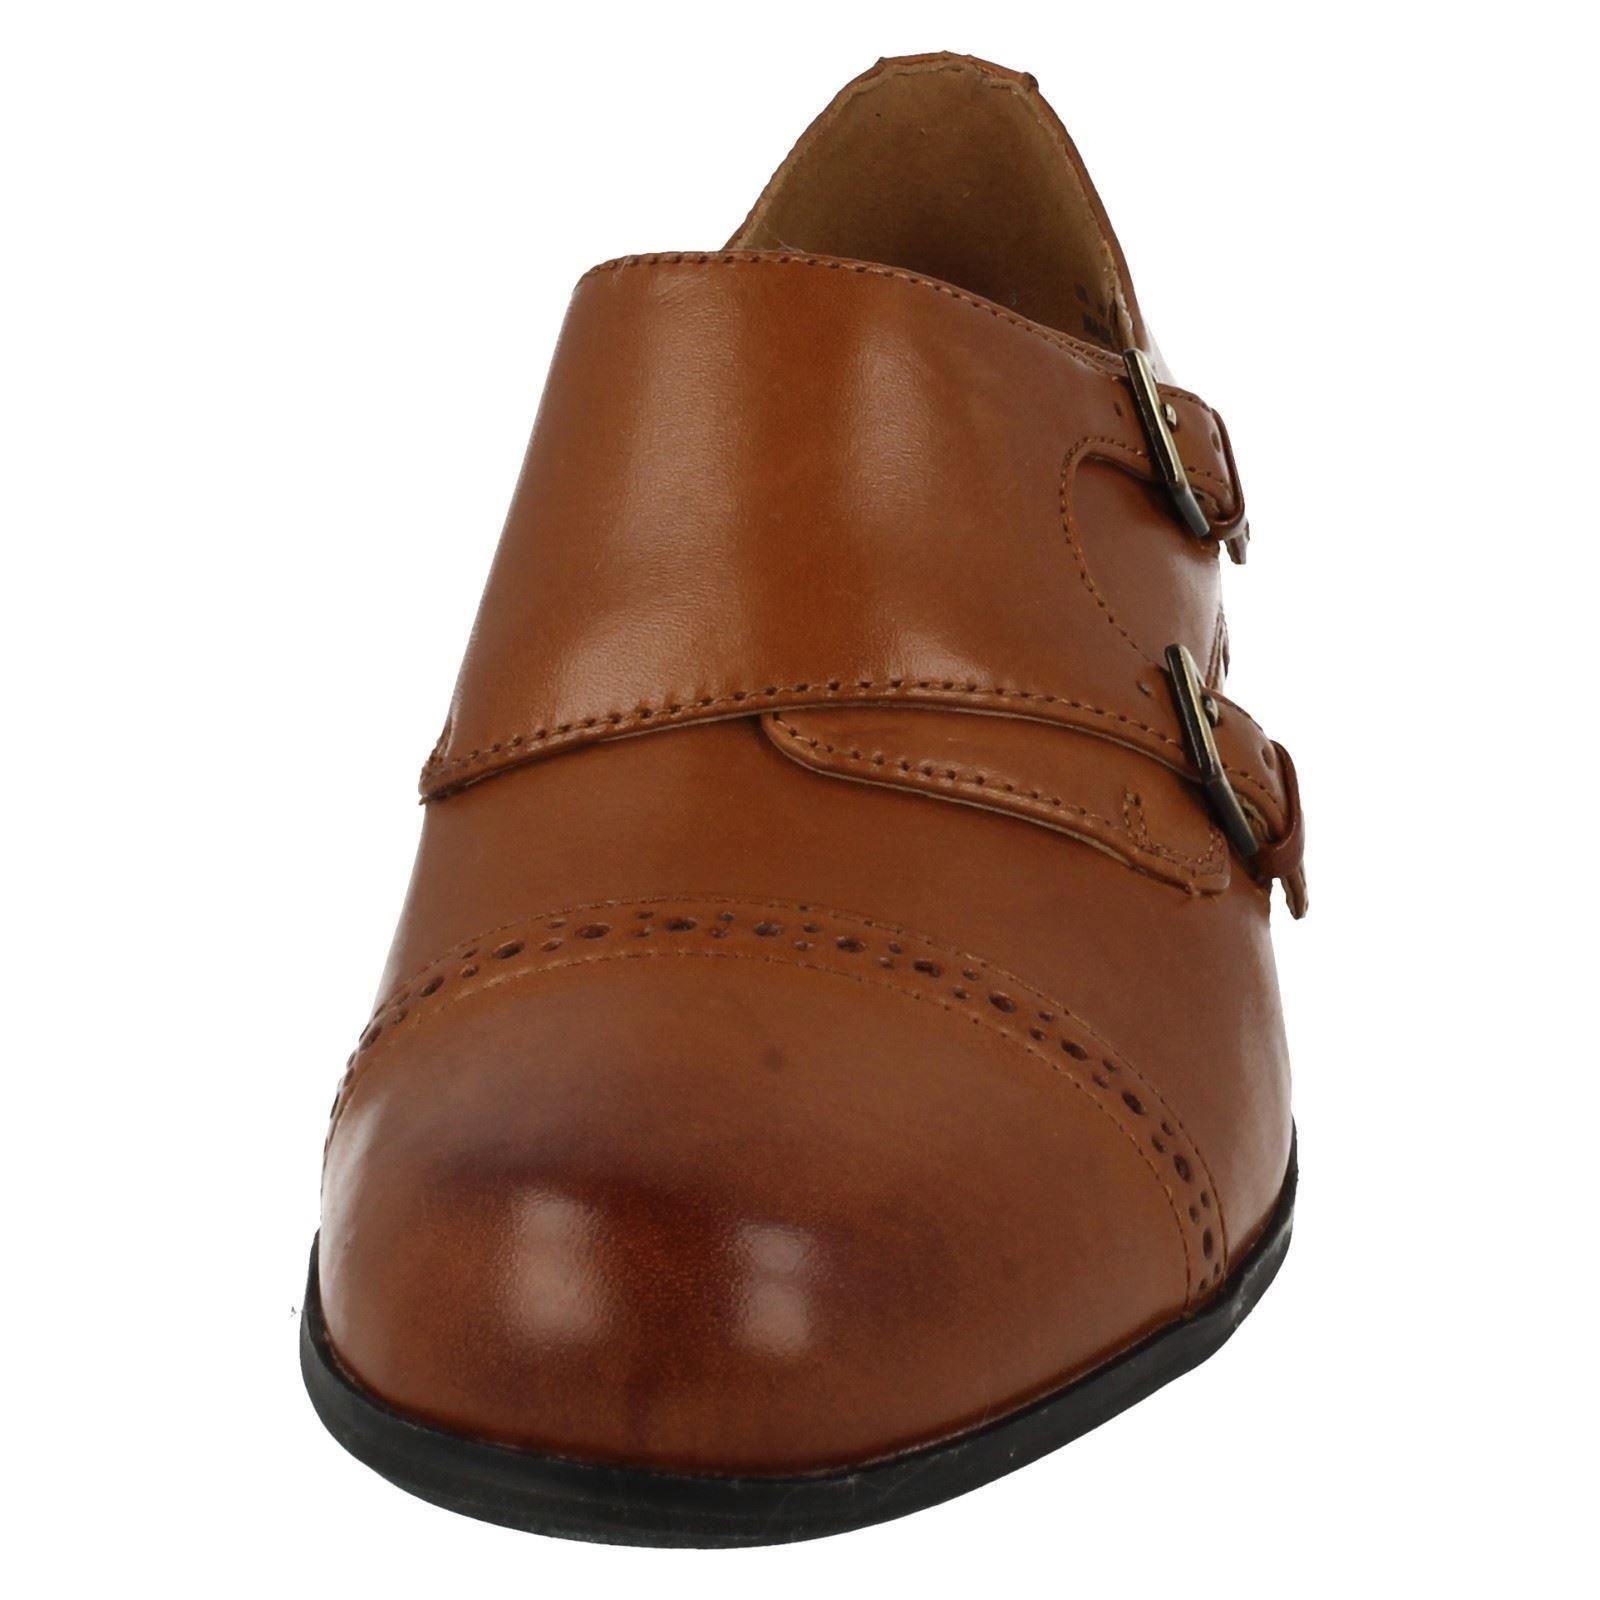 Damen Clarks mit Schnallen Förmliche Schuhe 'Hamble 'Hamble 'Hamble Park' a00d01